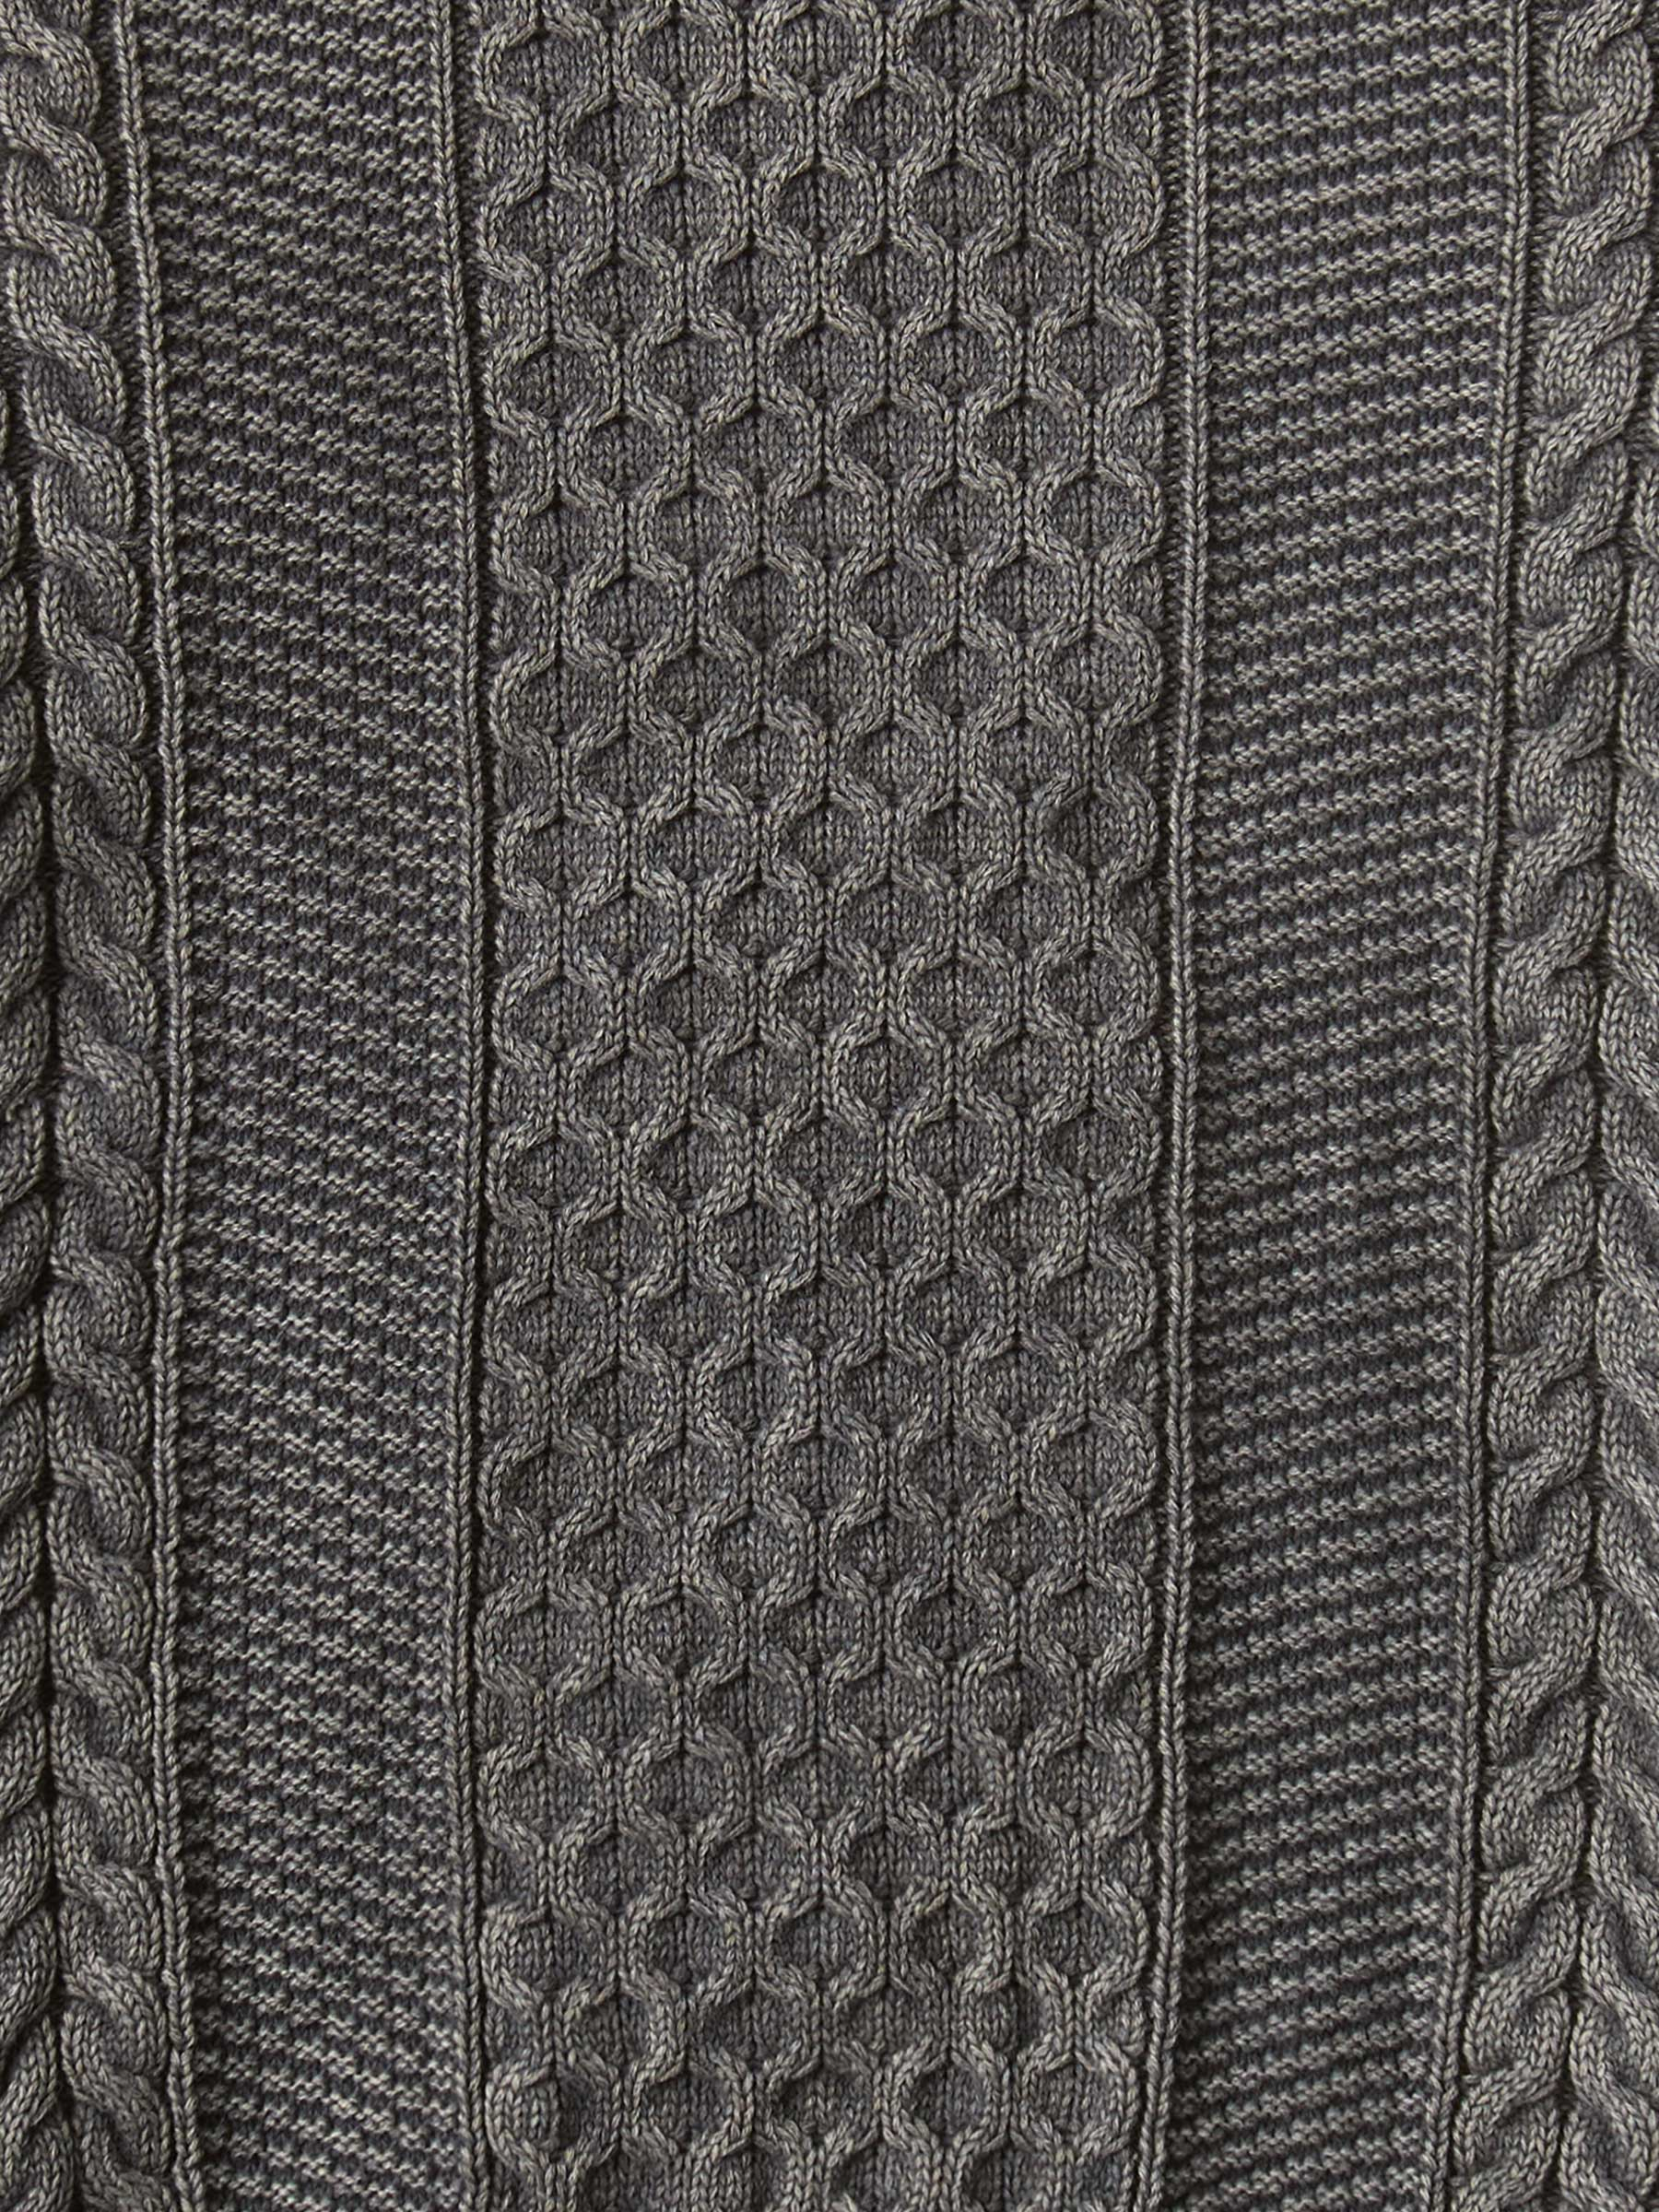 Buck Mason - Vintage Coal Vintage Dyed Cotton Cable Crew Sweater